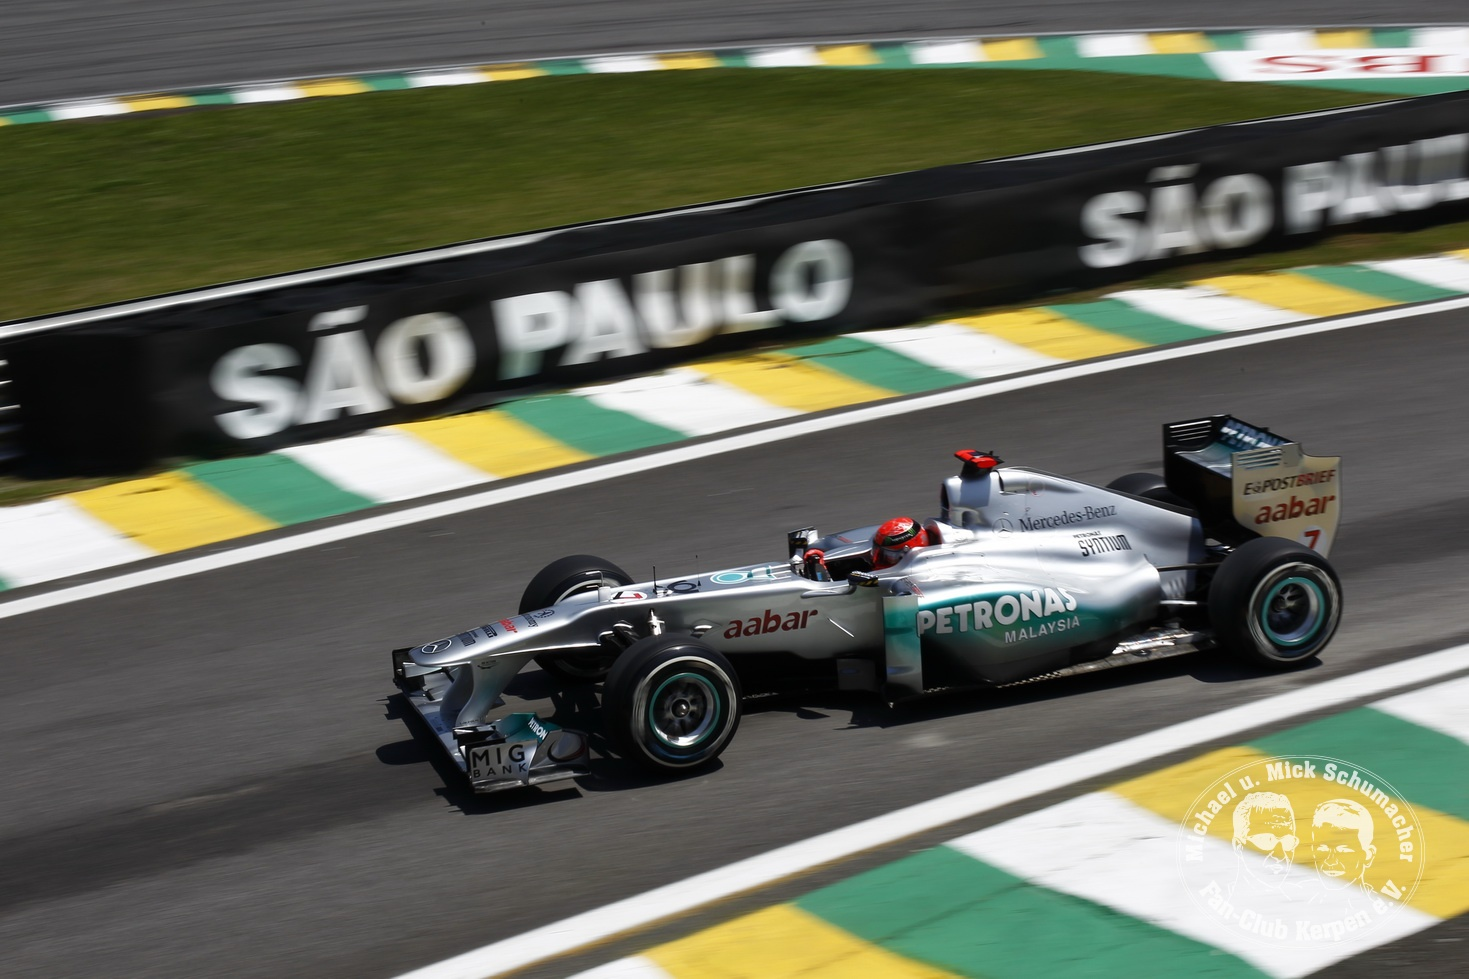 Formel 1, Grand Prix Brasilien 2011, Interlagos, 27.11.2011